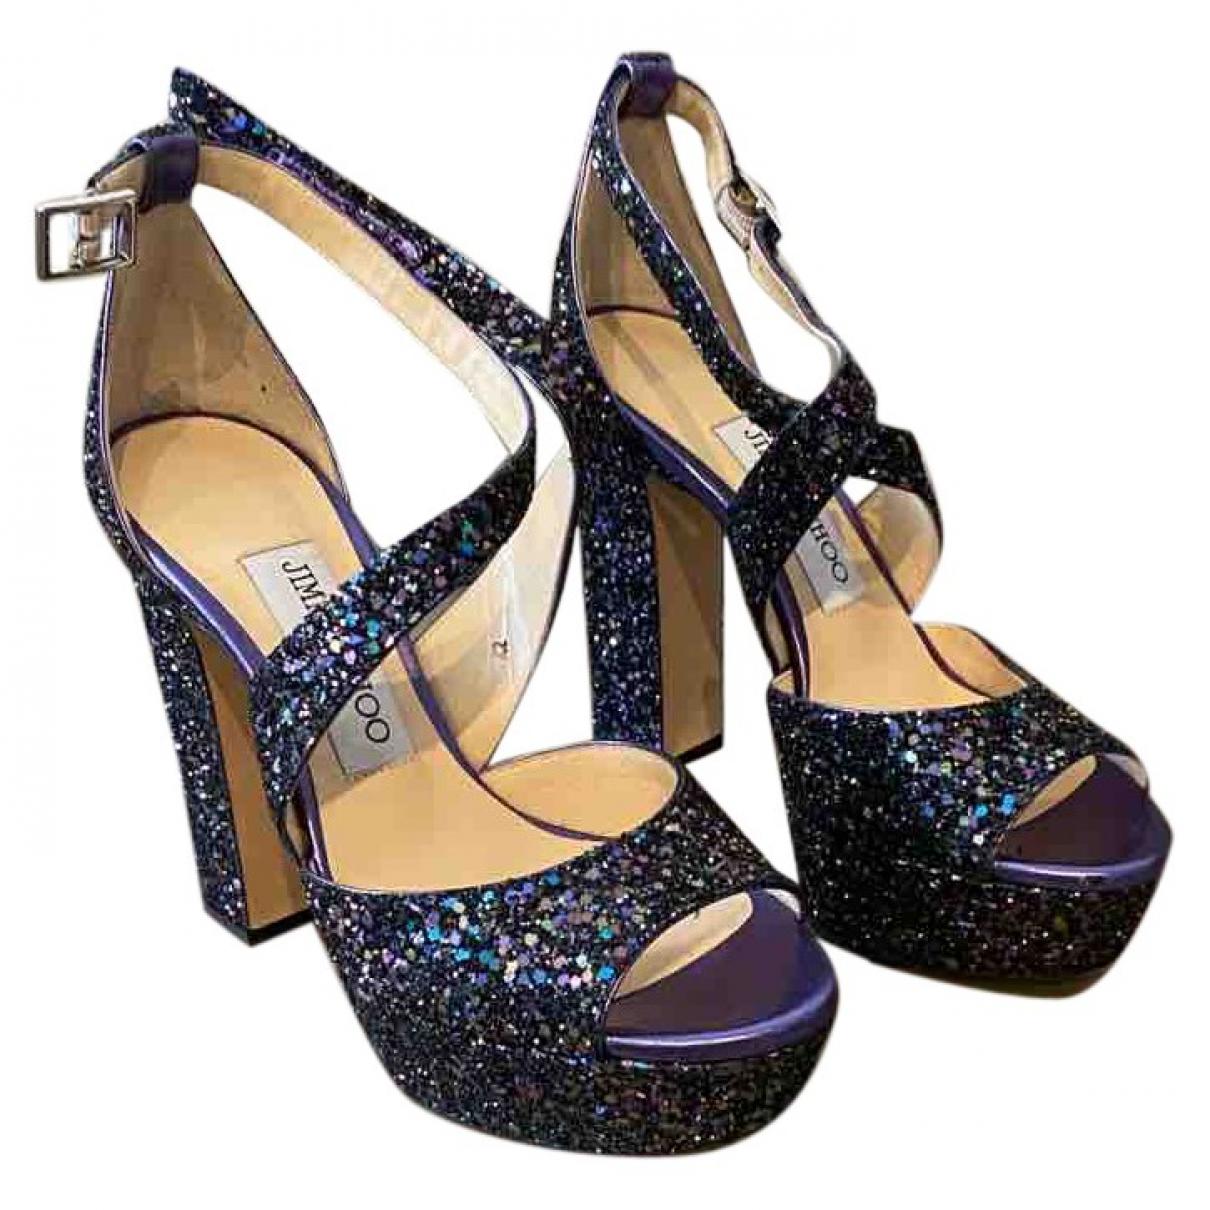 Jimmy Choo Emily Multicolour Glitter Sandals for Women 35 EU